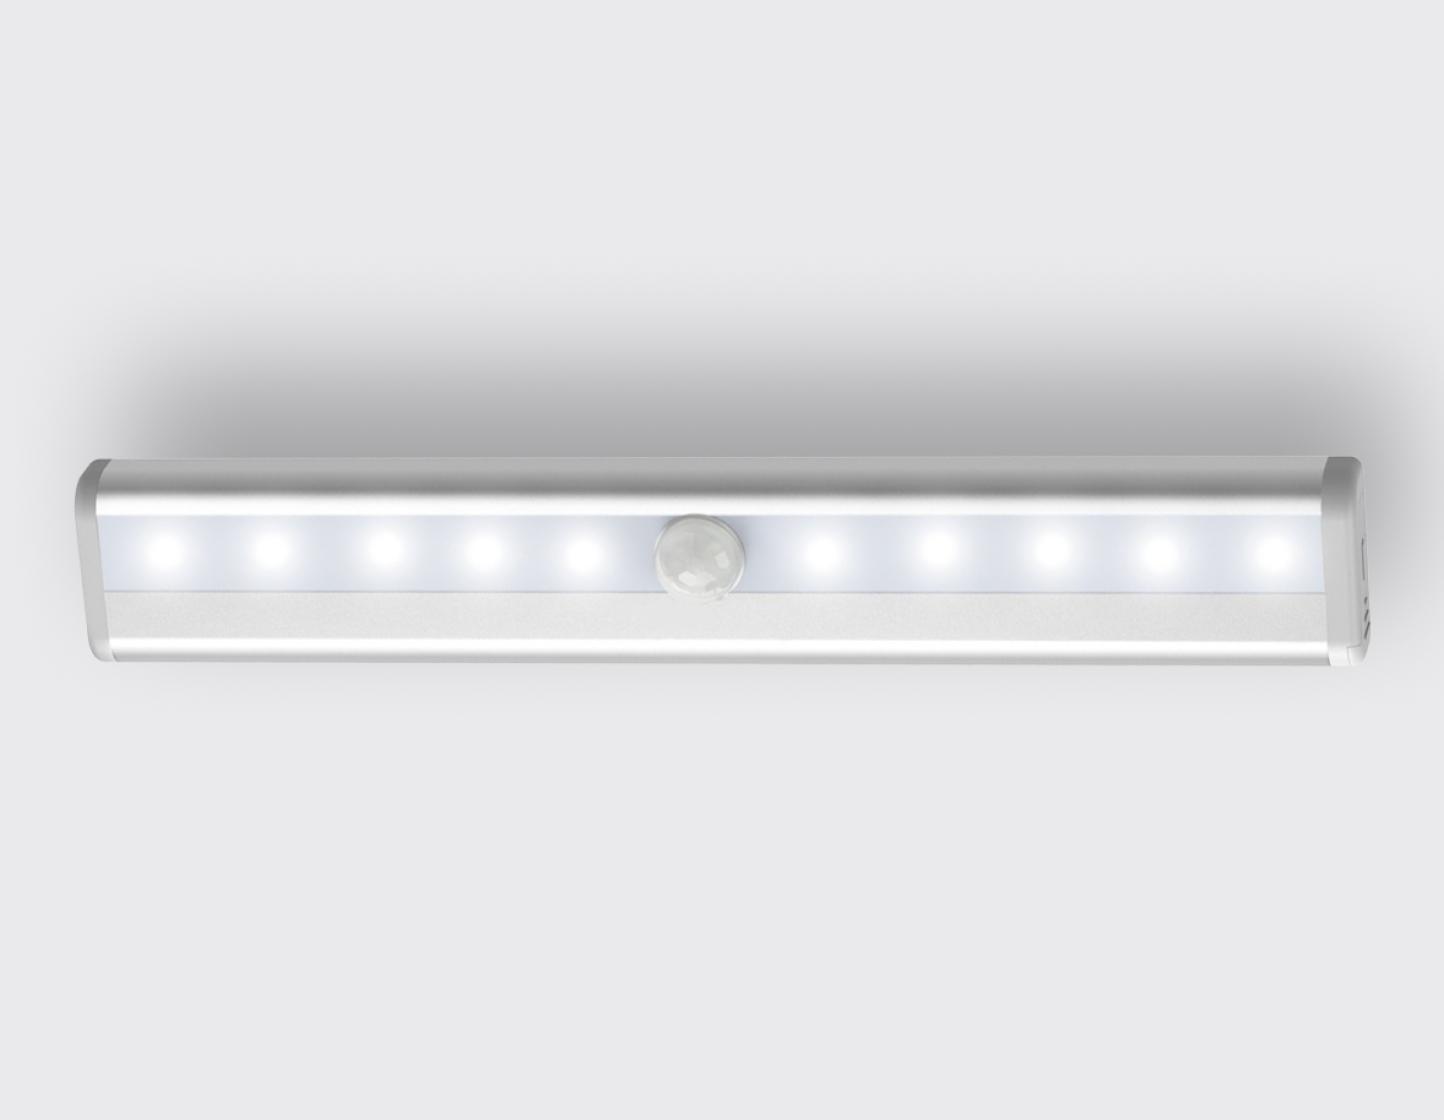 Motion Glo Led Light Bar With Sensor